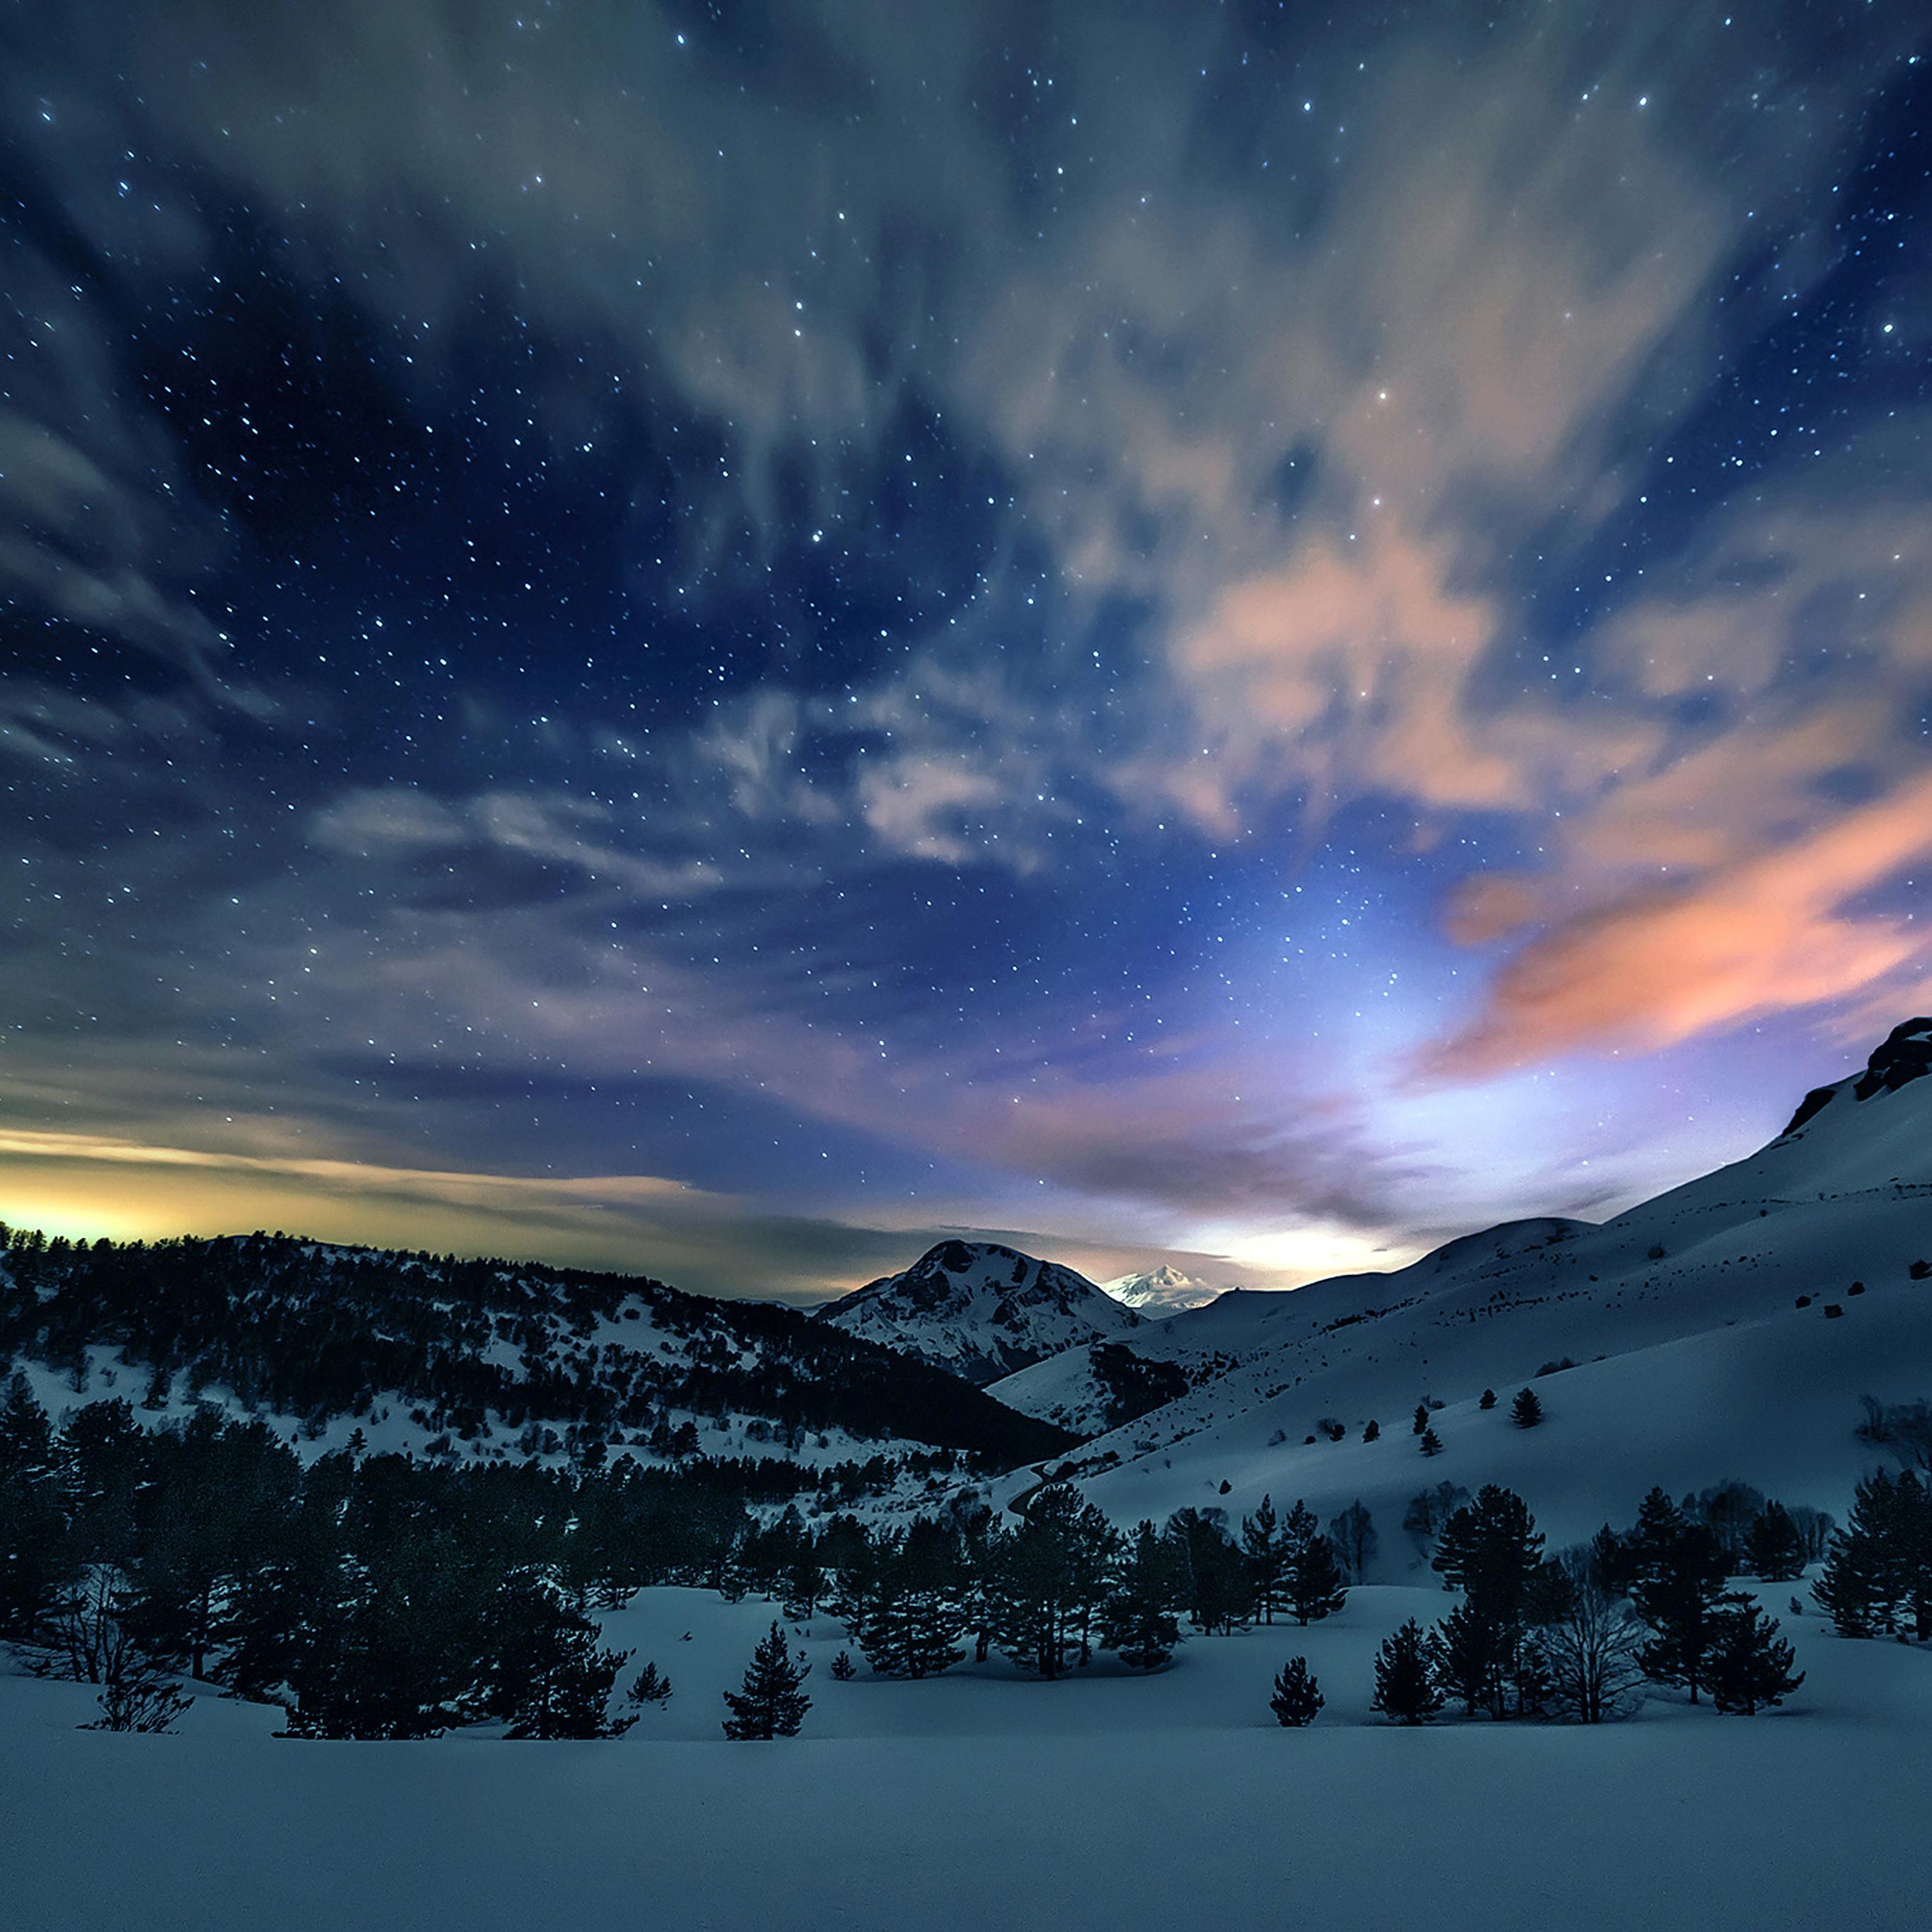 Mk78-aurora-star-sky-snow-mountain-winter-nature